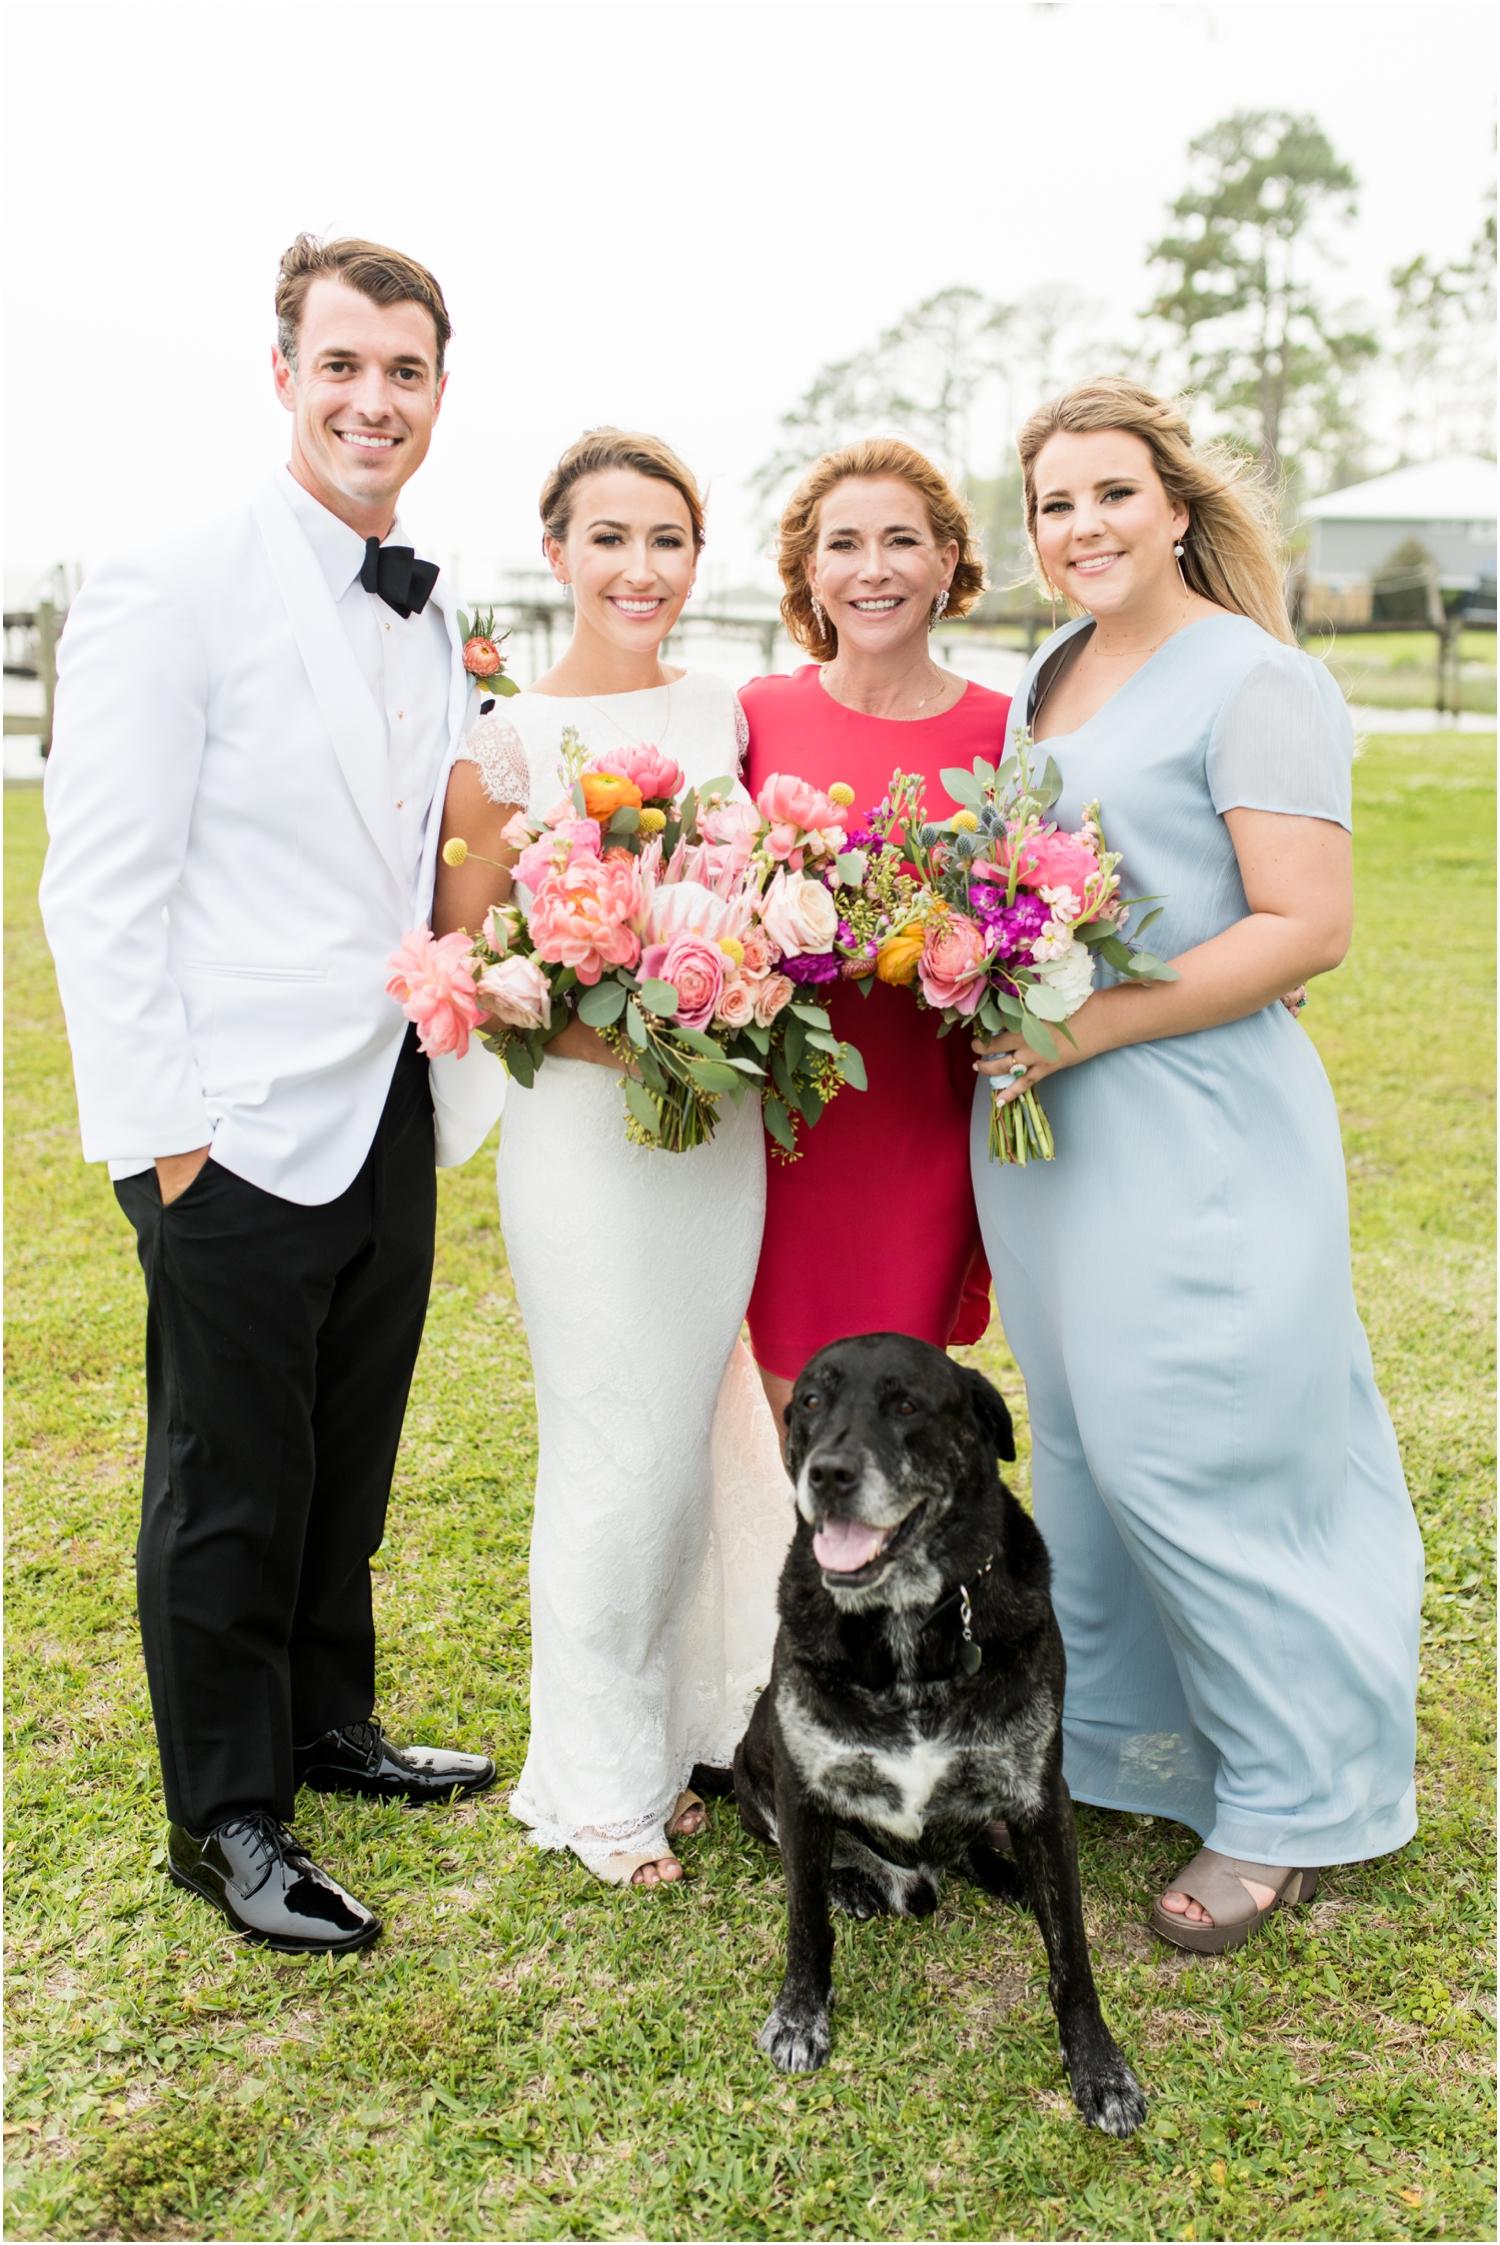 Gulf Shores Orange Beach Alabama Family Home on the Water Wedding Photographer family